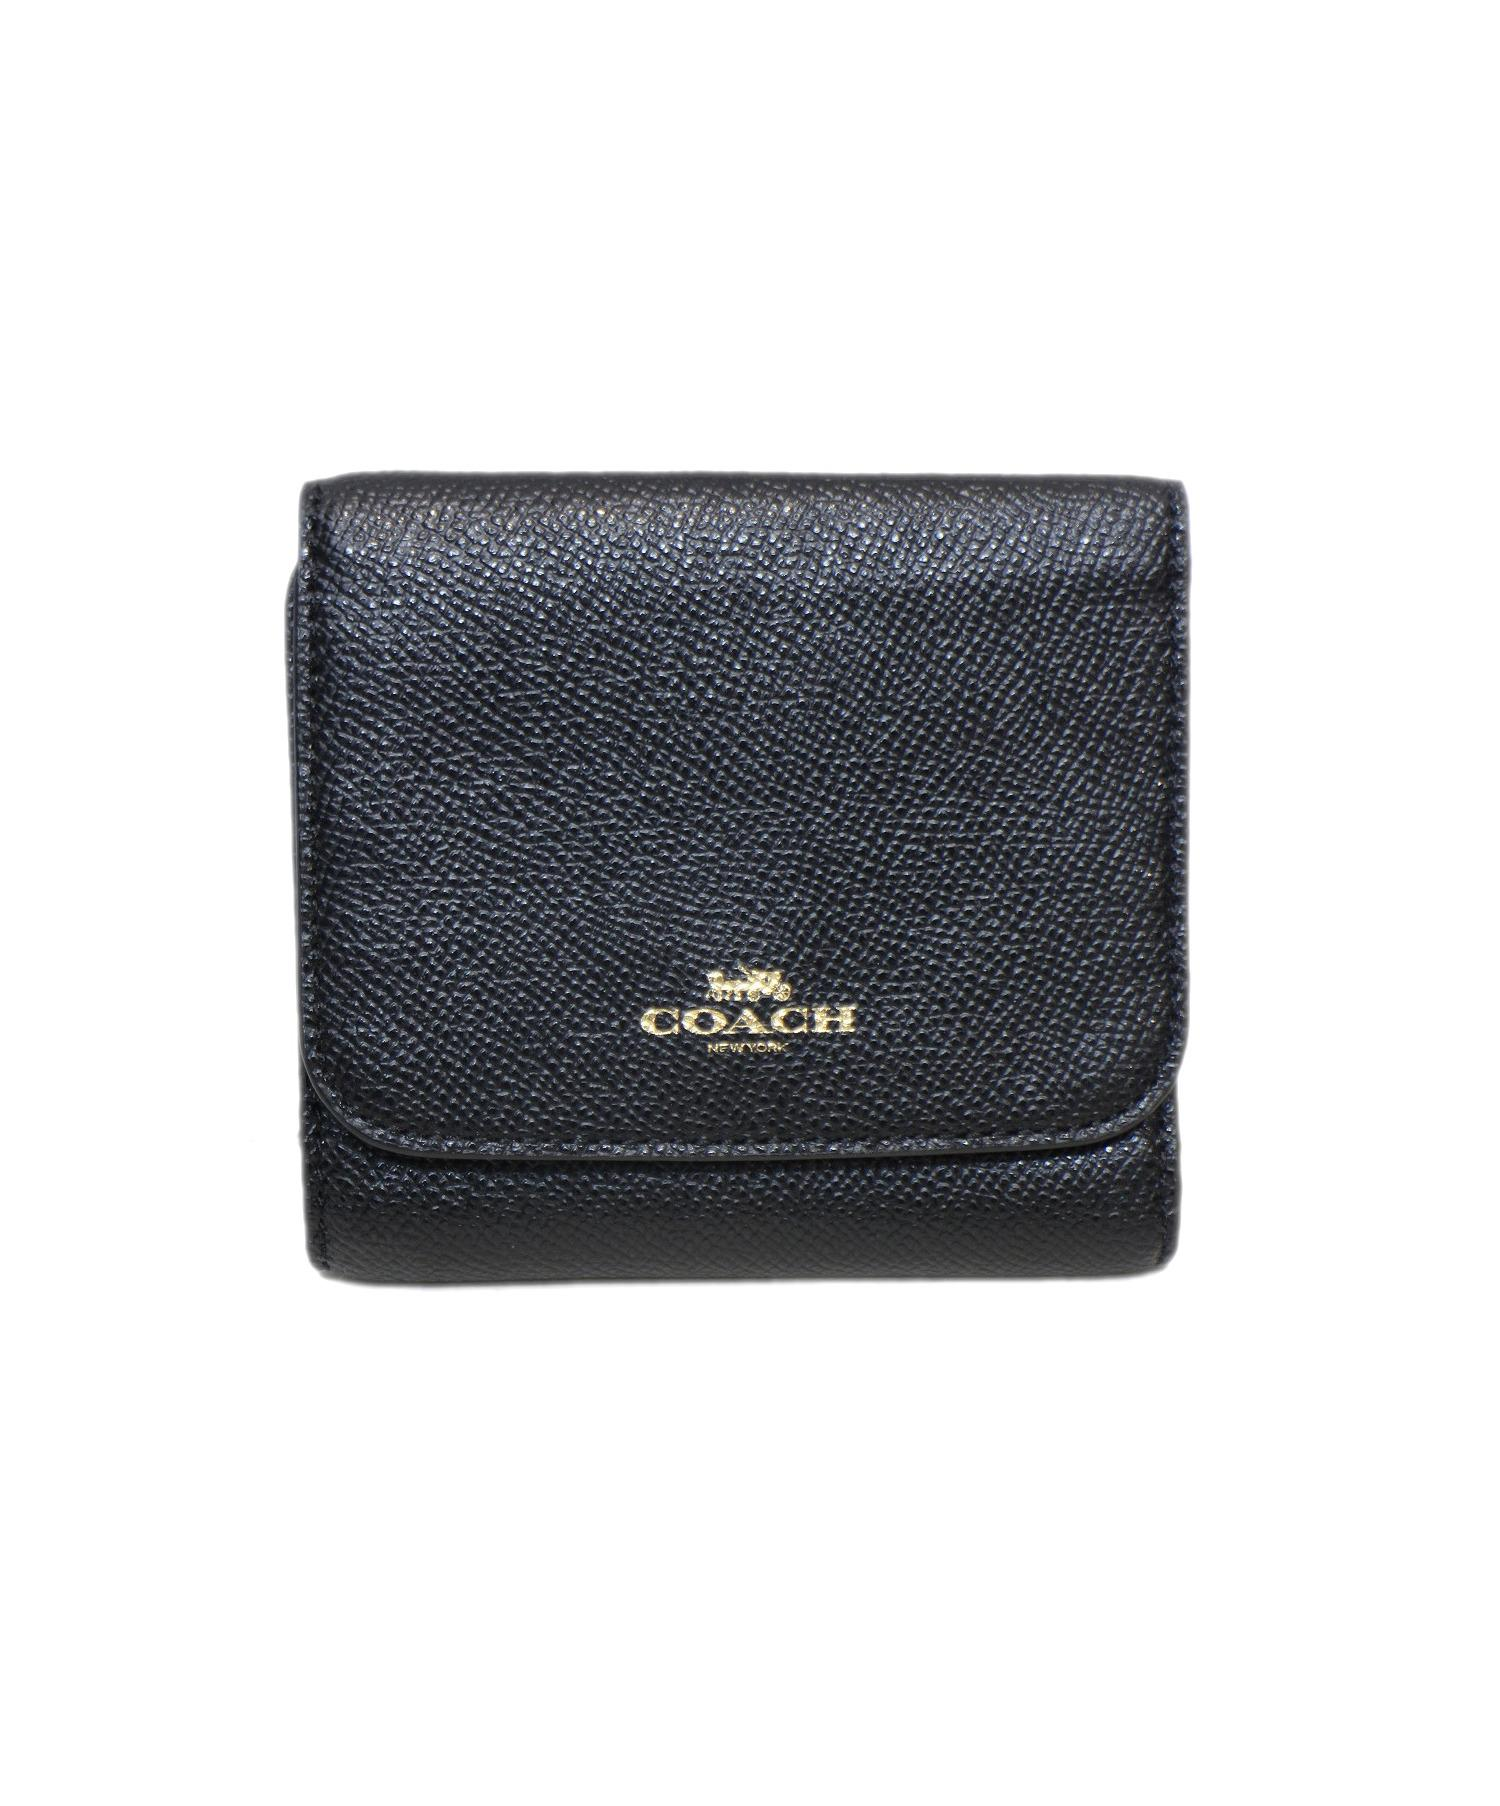 the latest 440a1 d8694 [中古]COACH(コーチ)のレディース 服飾小物 2つ折り財布